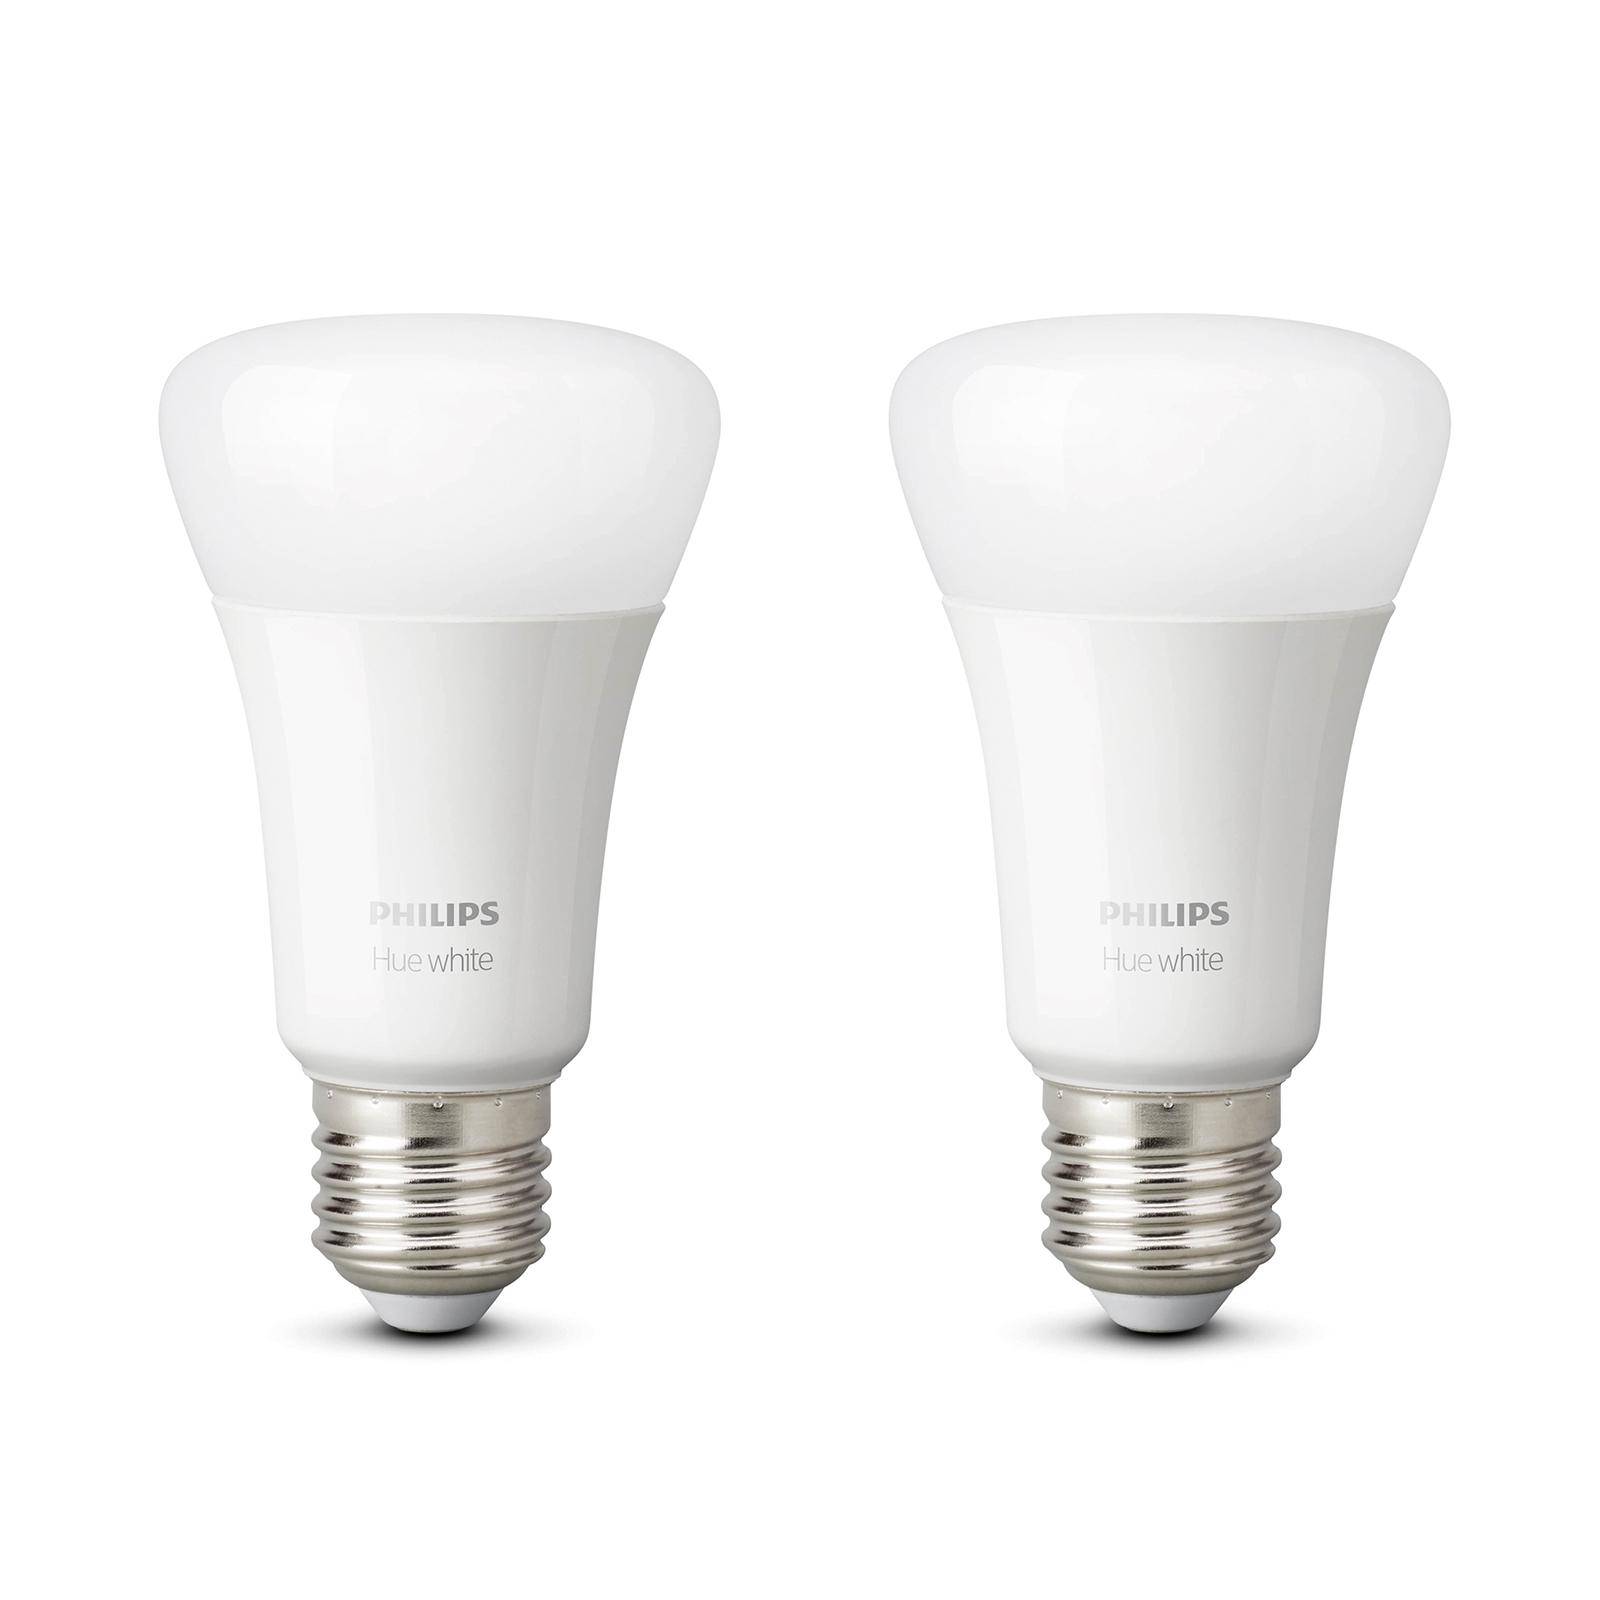 Philips Hue White 9 W E27 LED-Lampe, 2er-Set